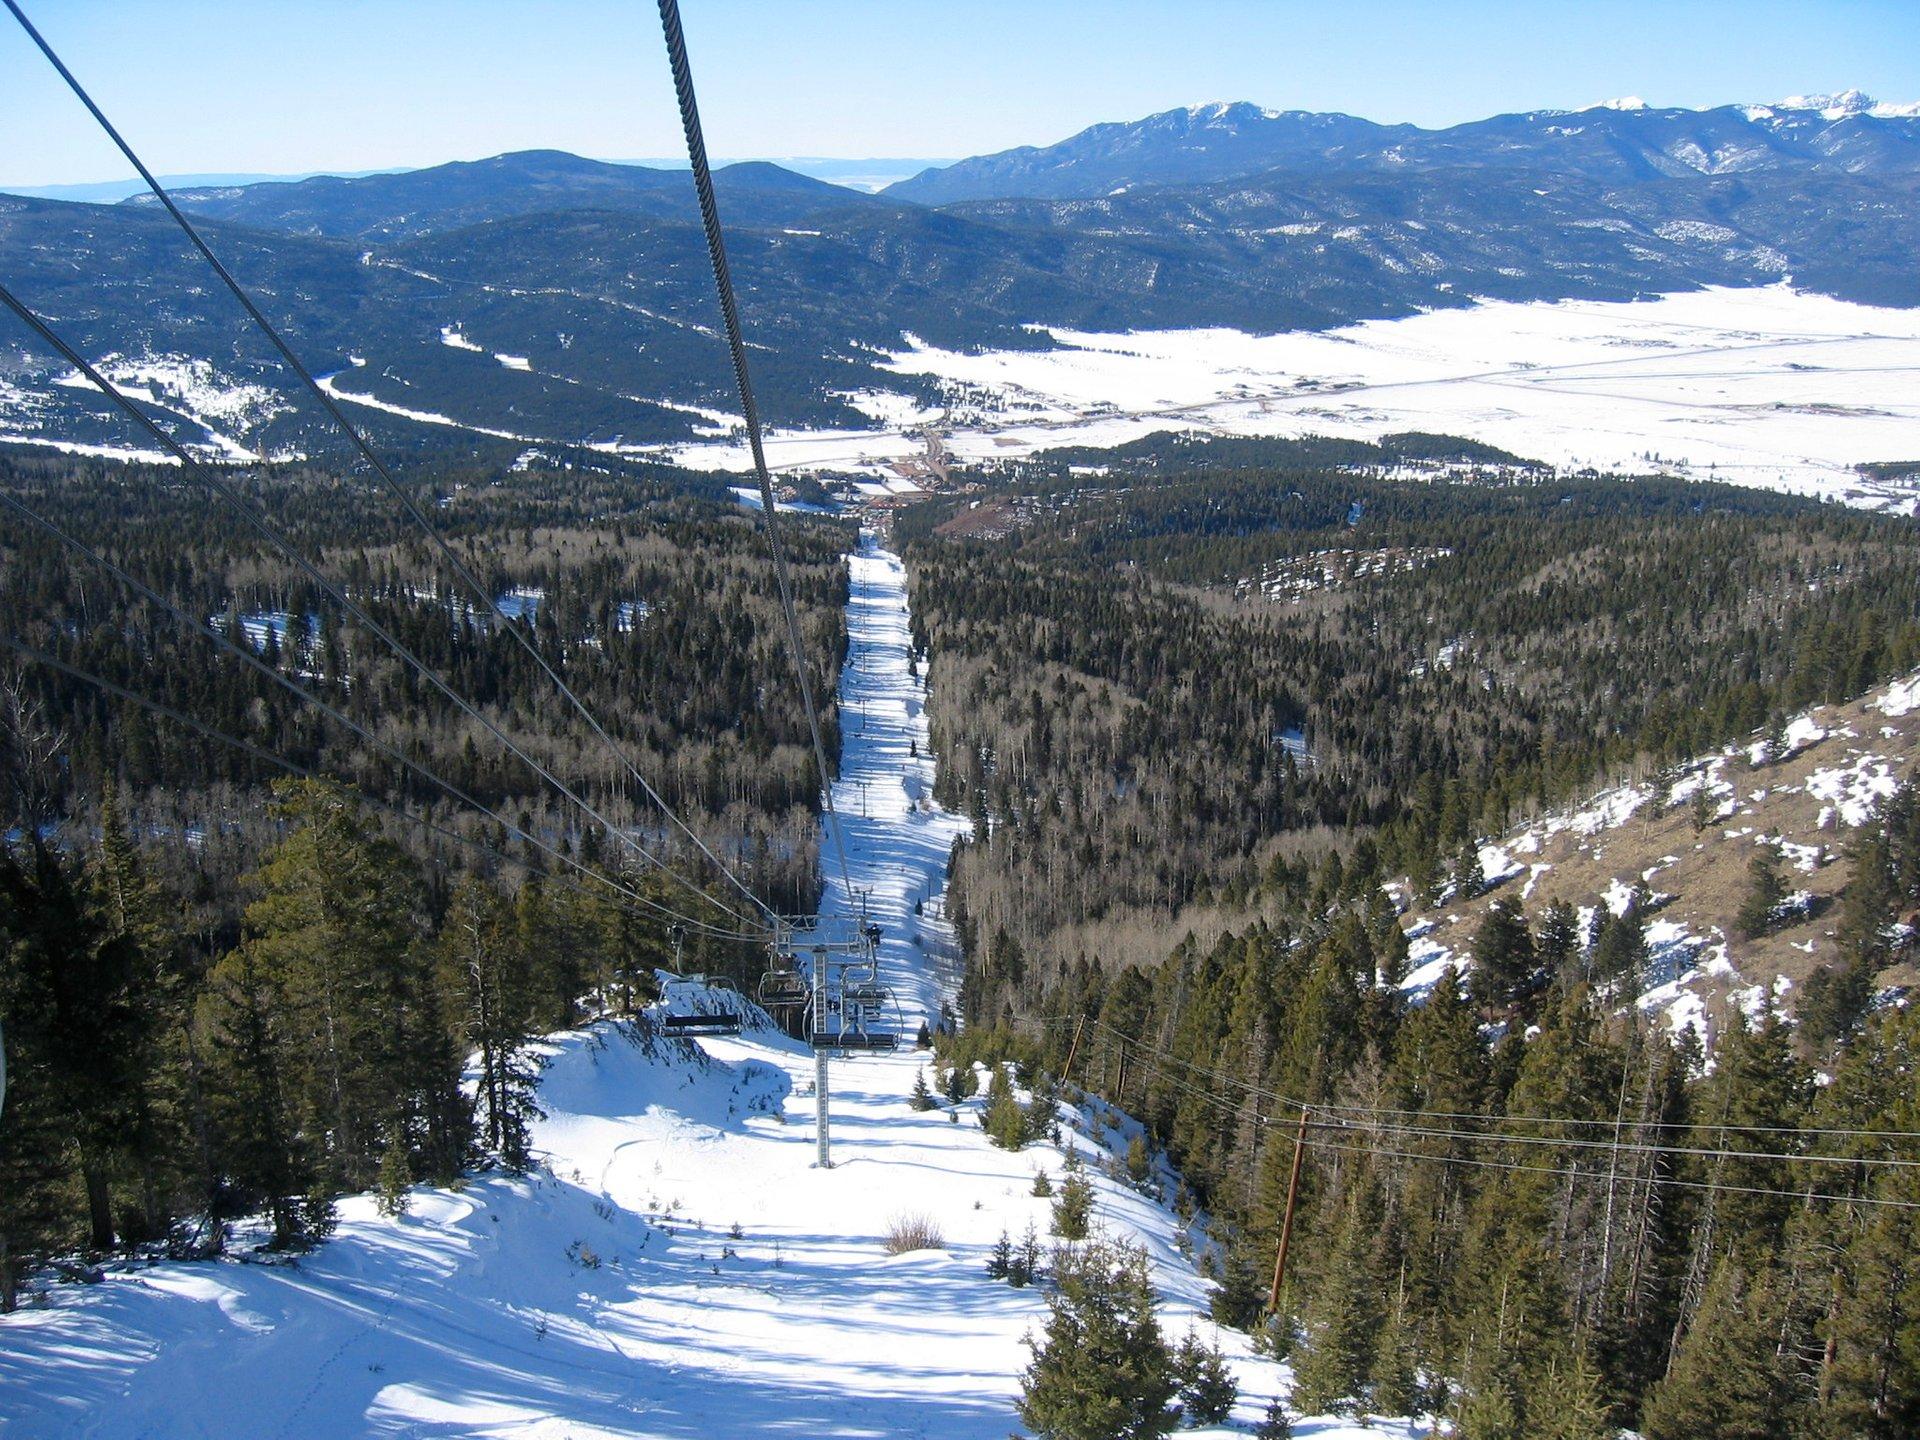 The 2K foot high ski lift @ Angel Fire 2020